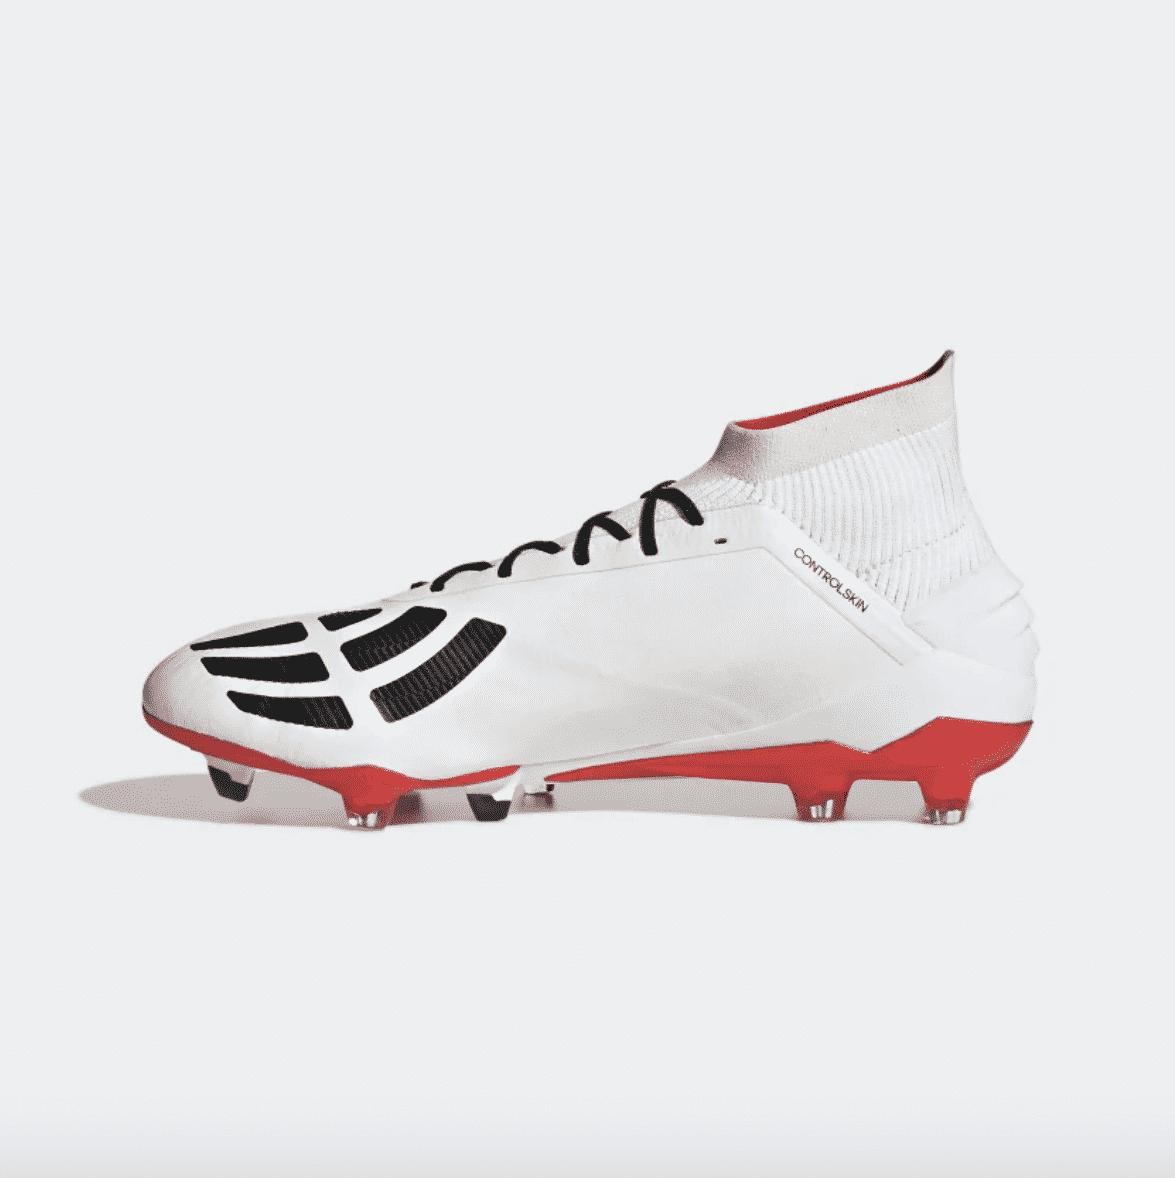 adidas-predator-19.1-reedition-predator-mania-blanc-6